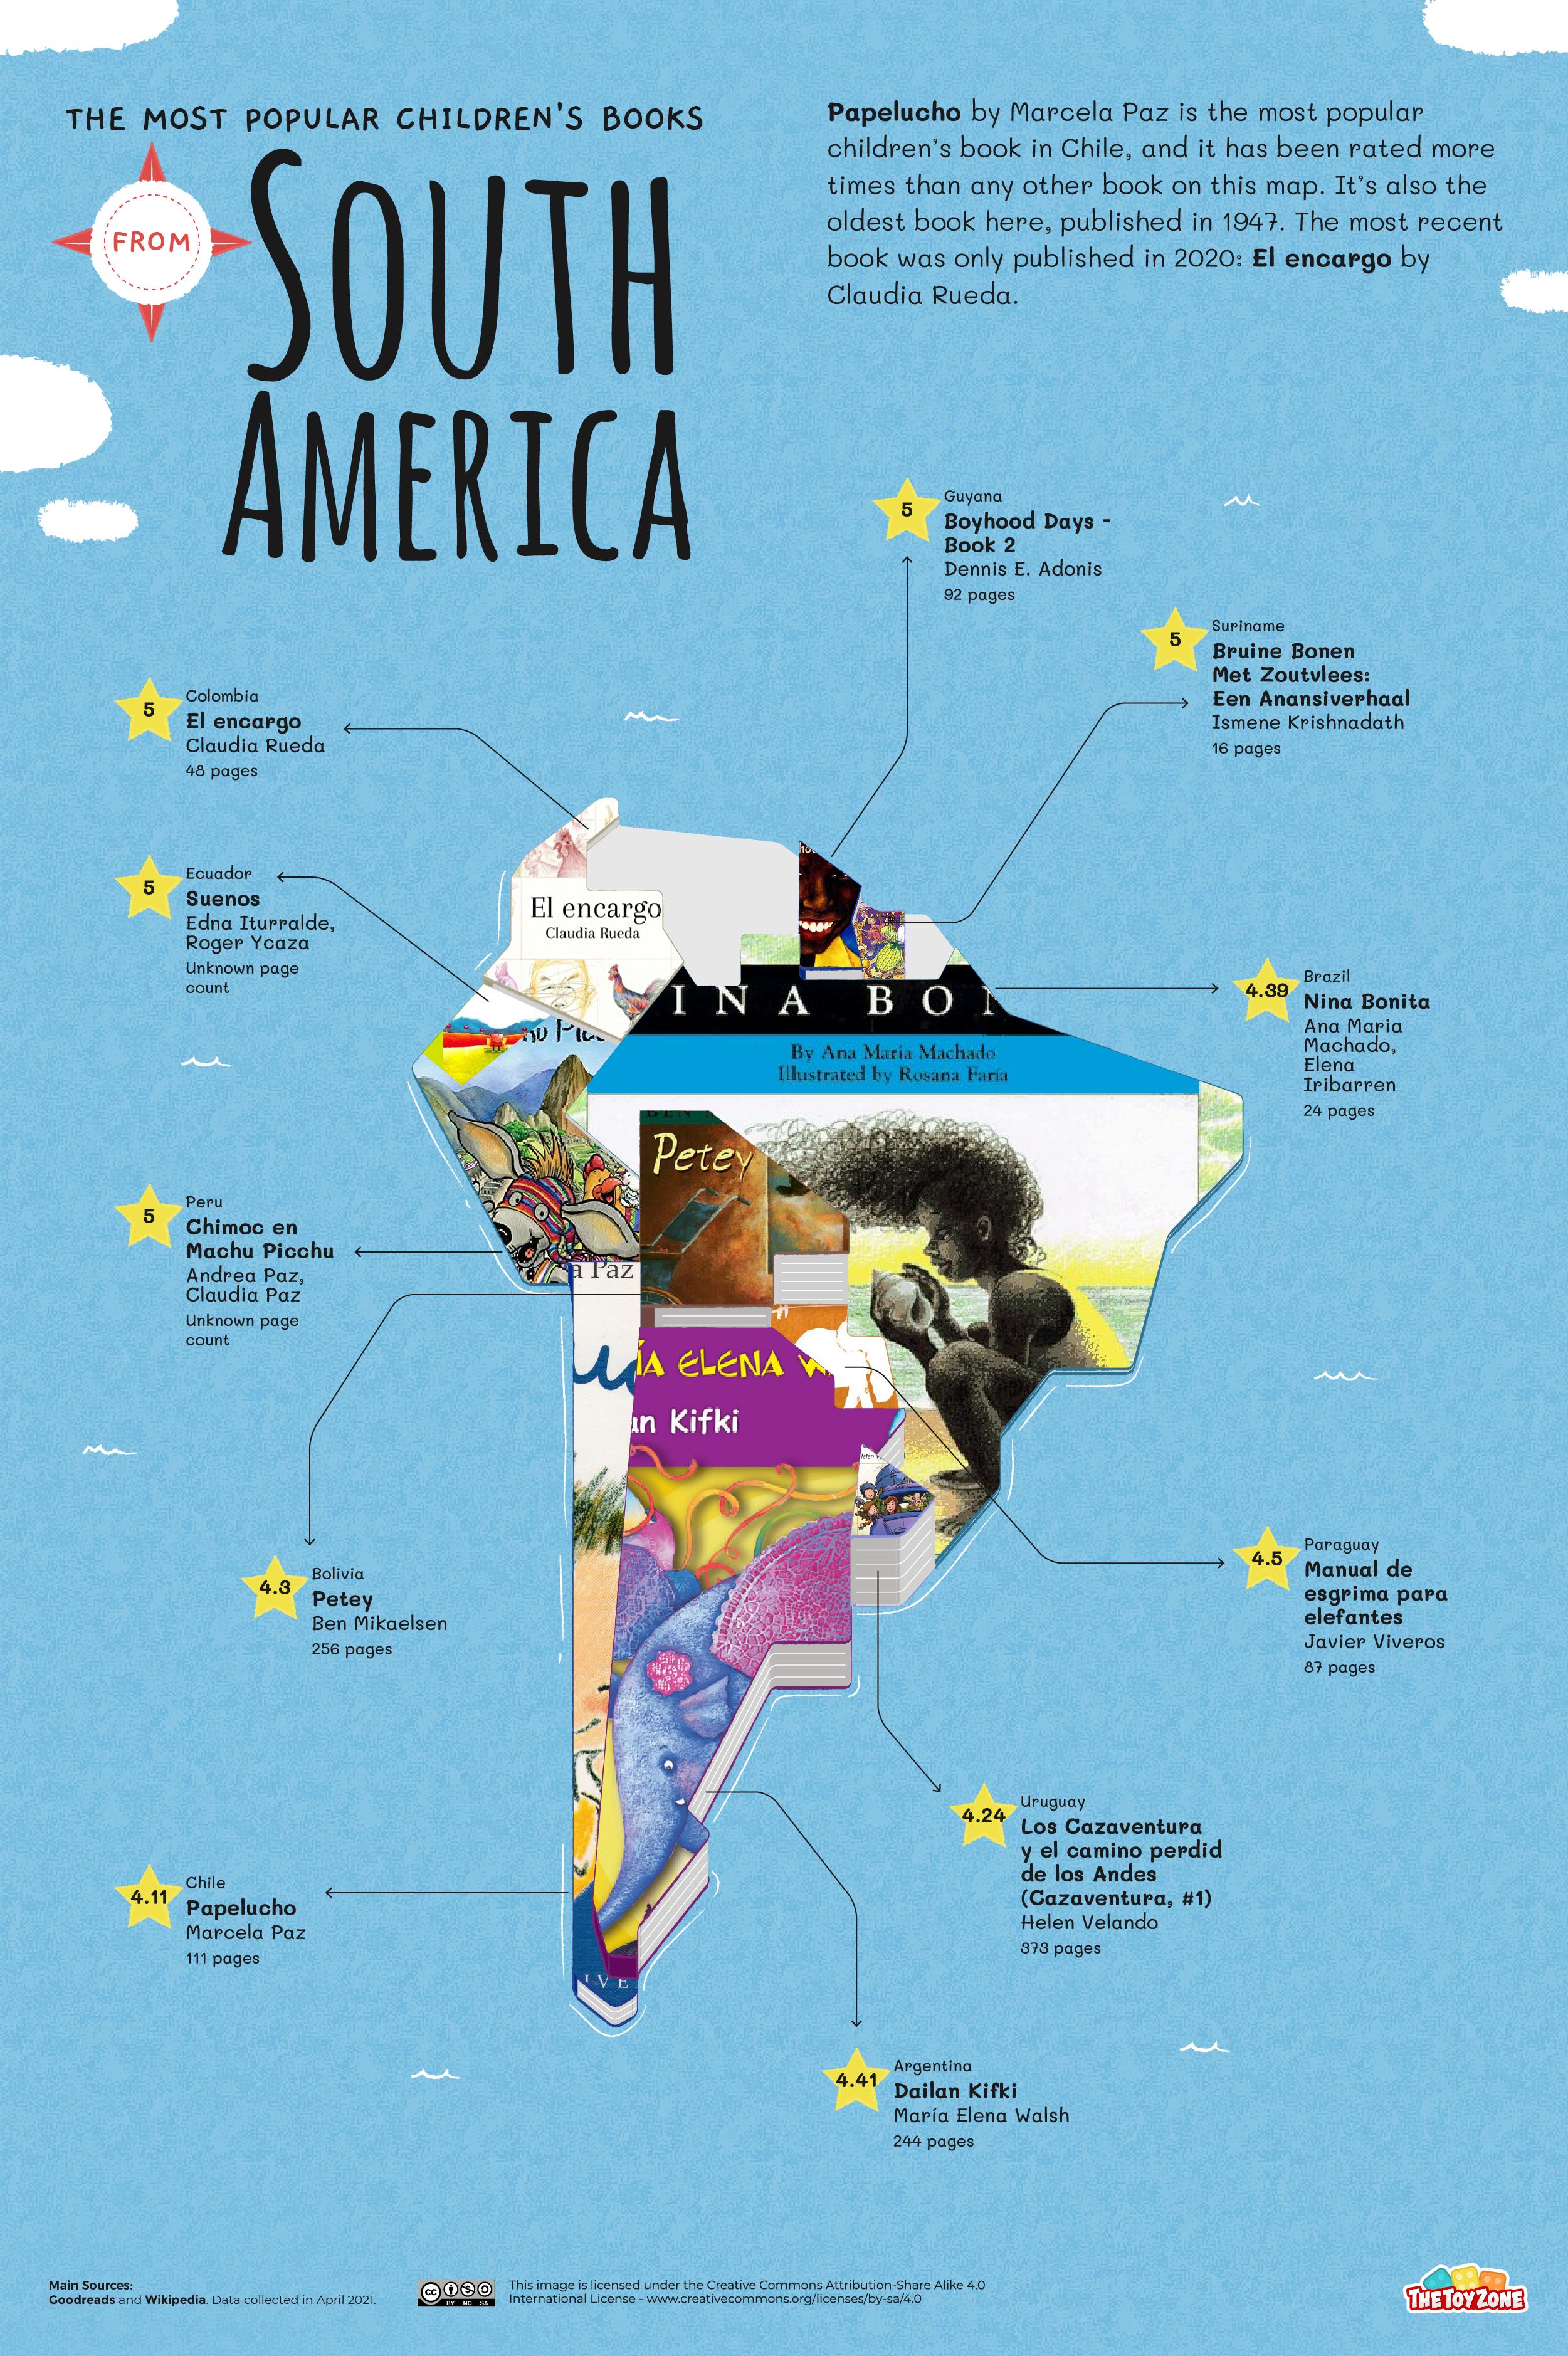 Most popular children's books in South America map